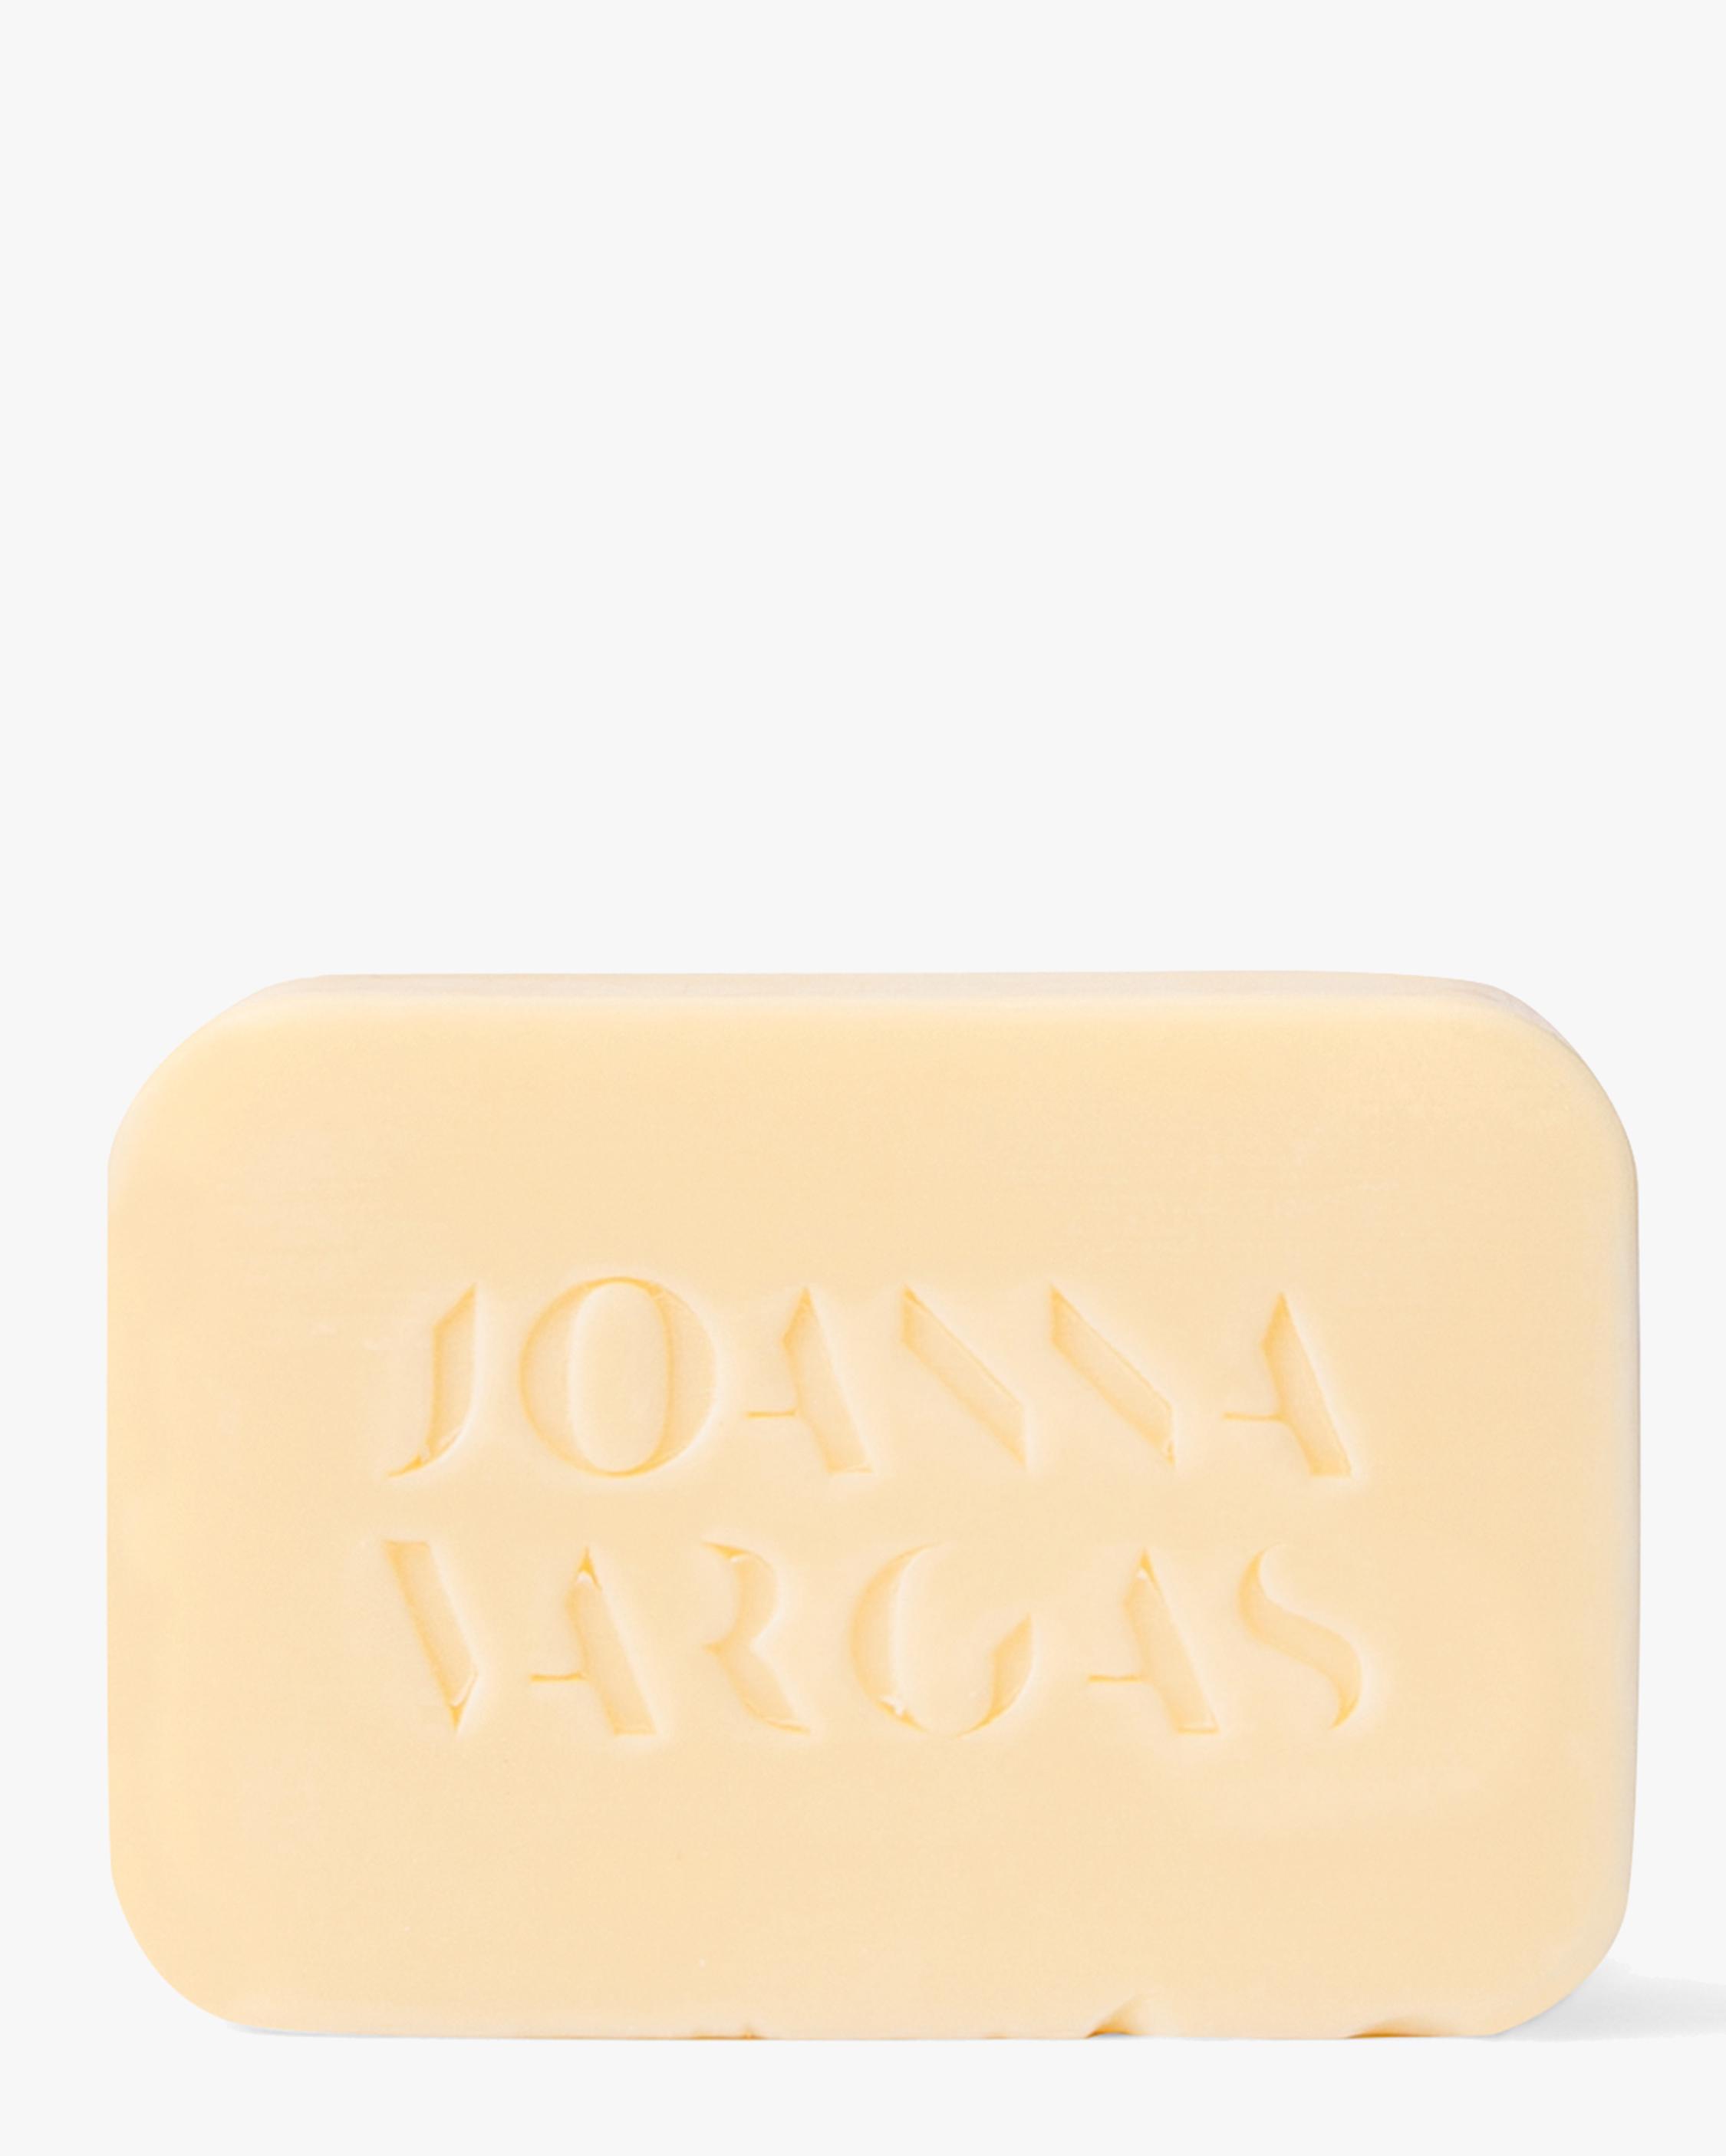 Joanna Vargas Skincare Cloud Bar 1